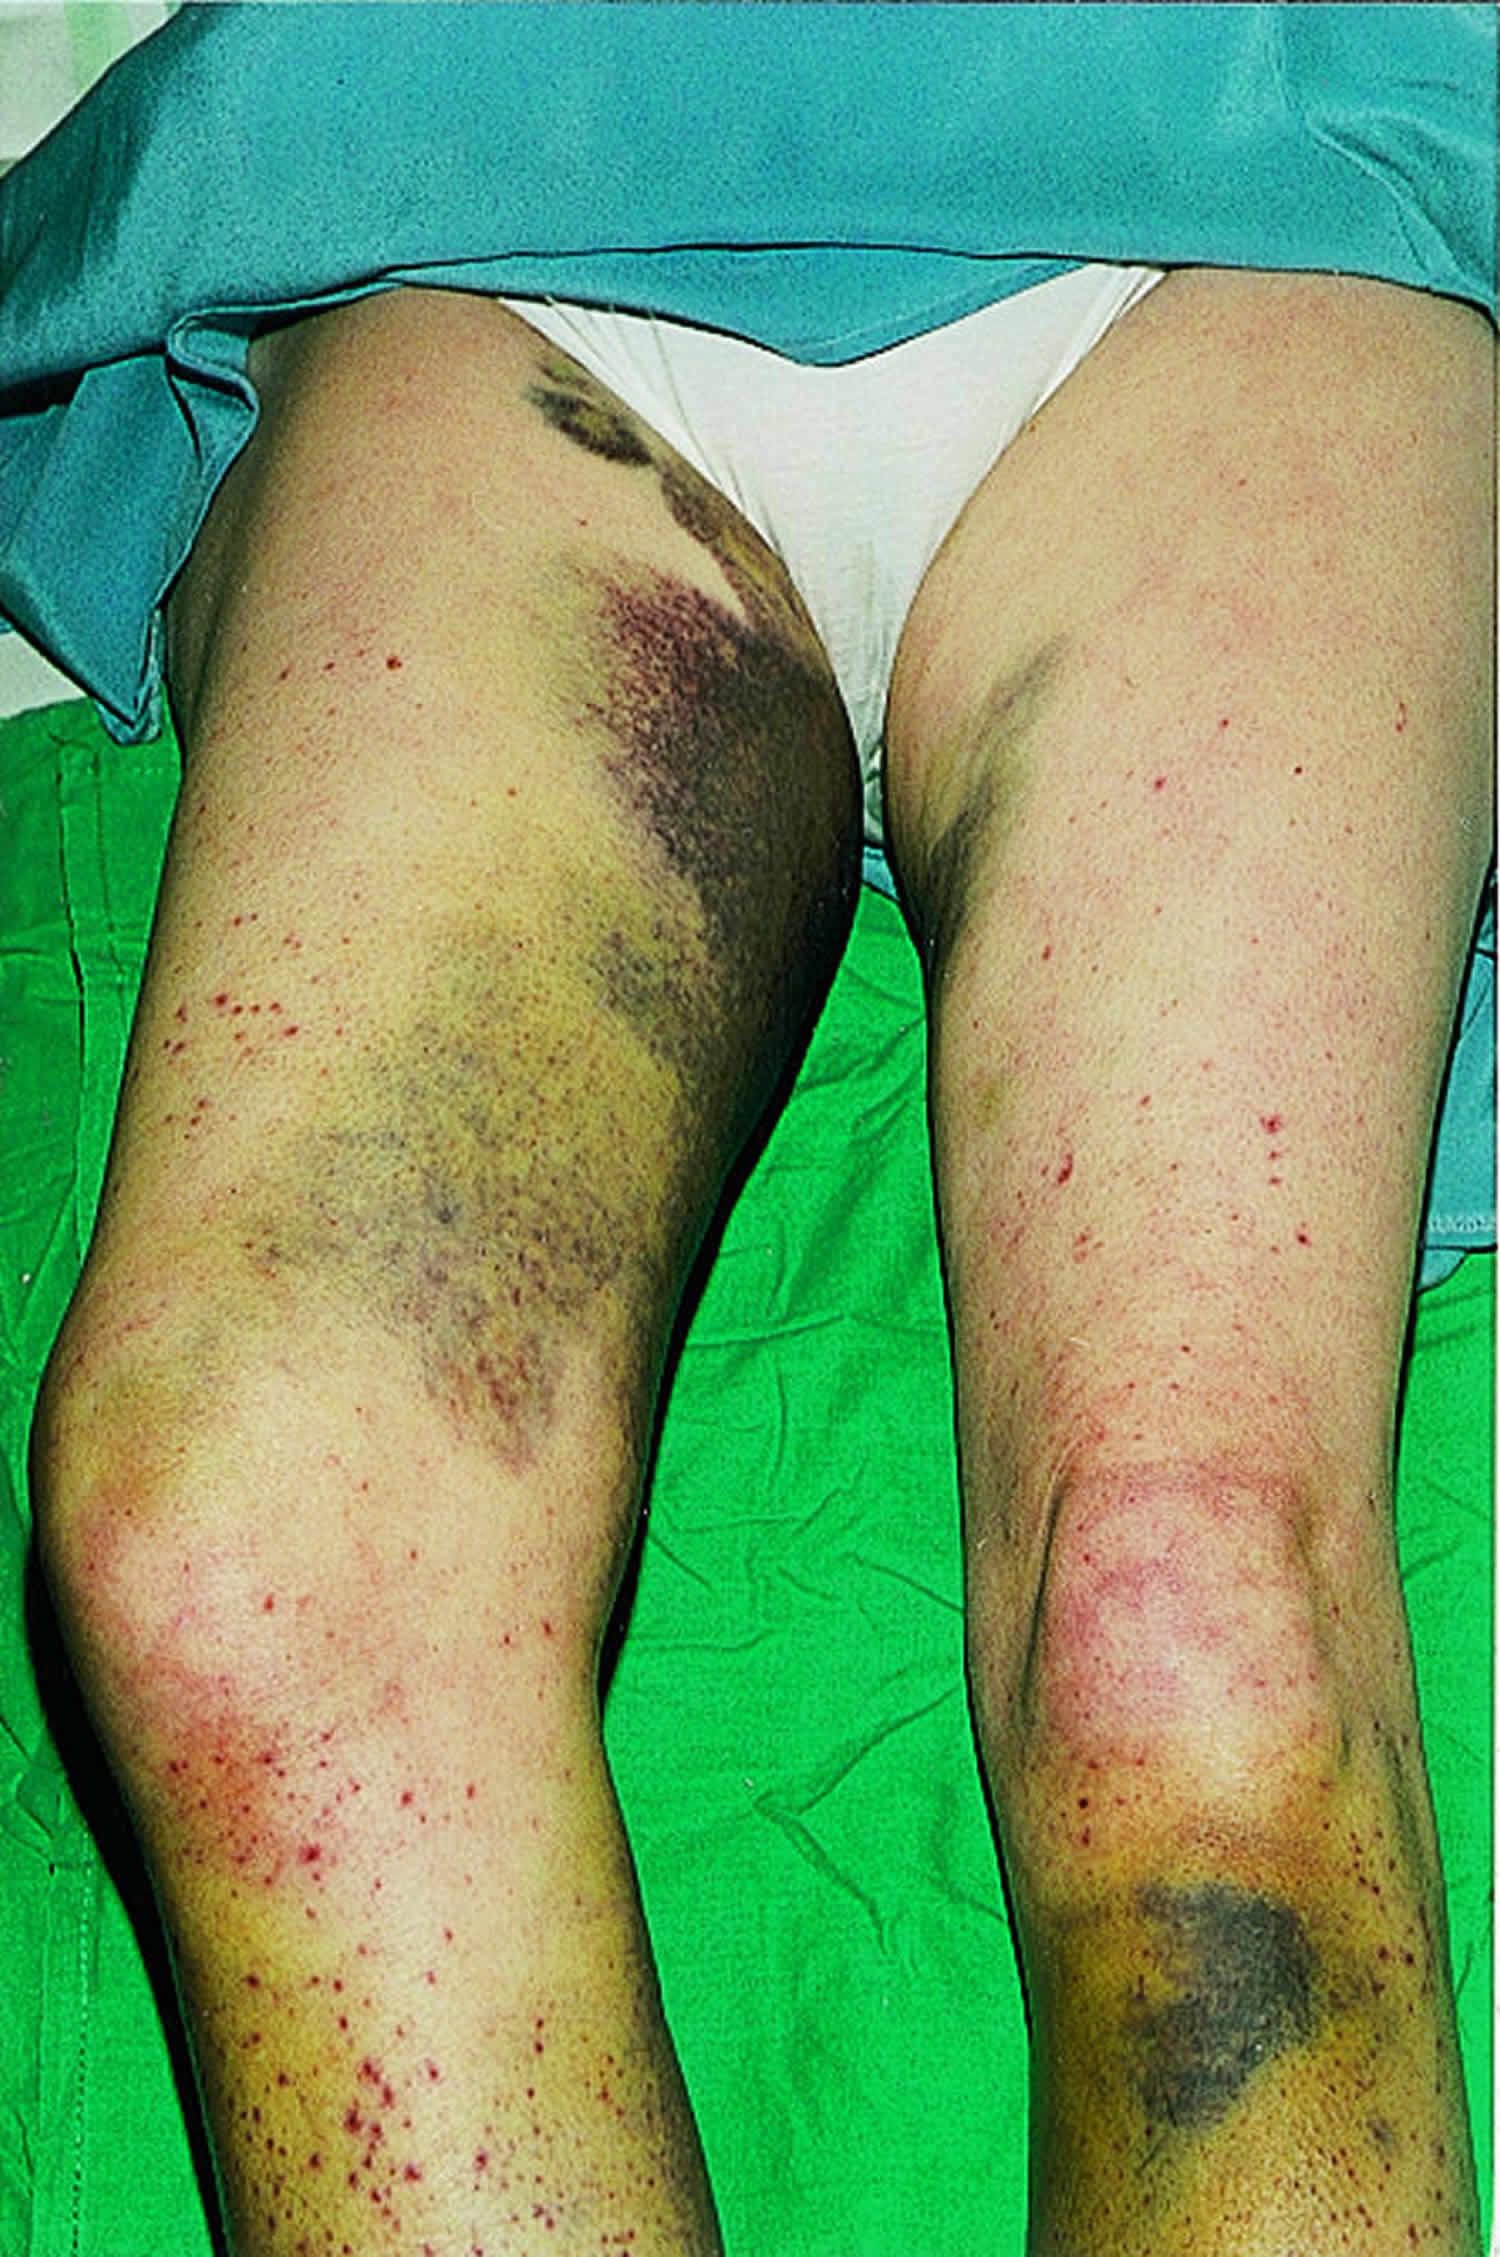 extensive bruising